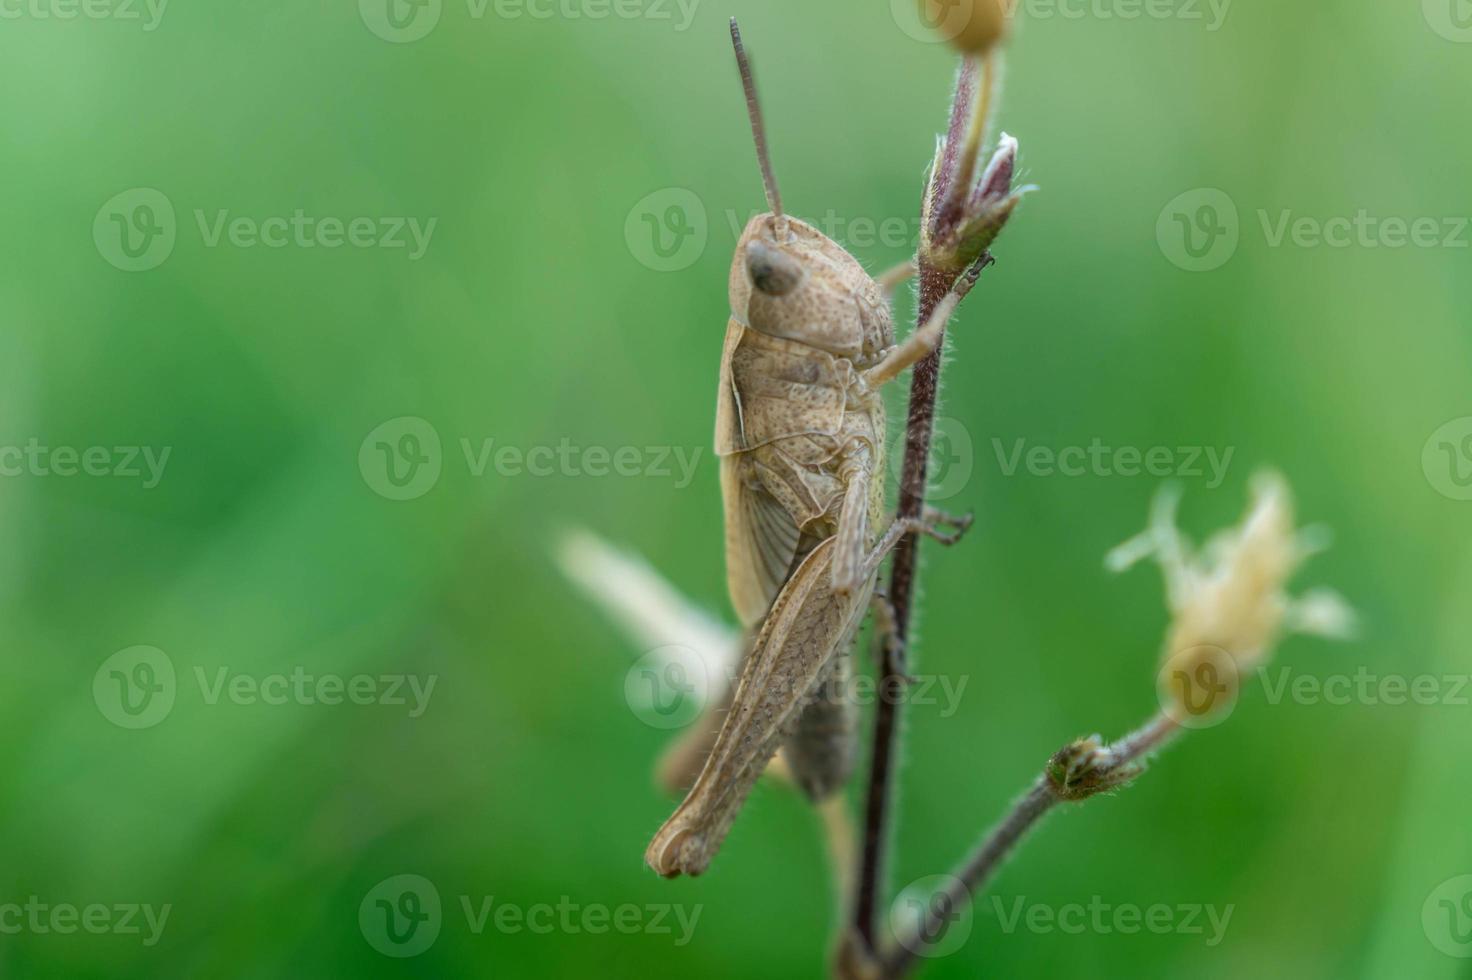 cricket arrampicata su uno stelo di una pianta. foto